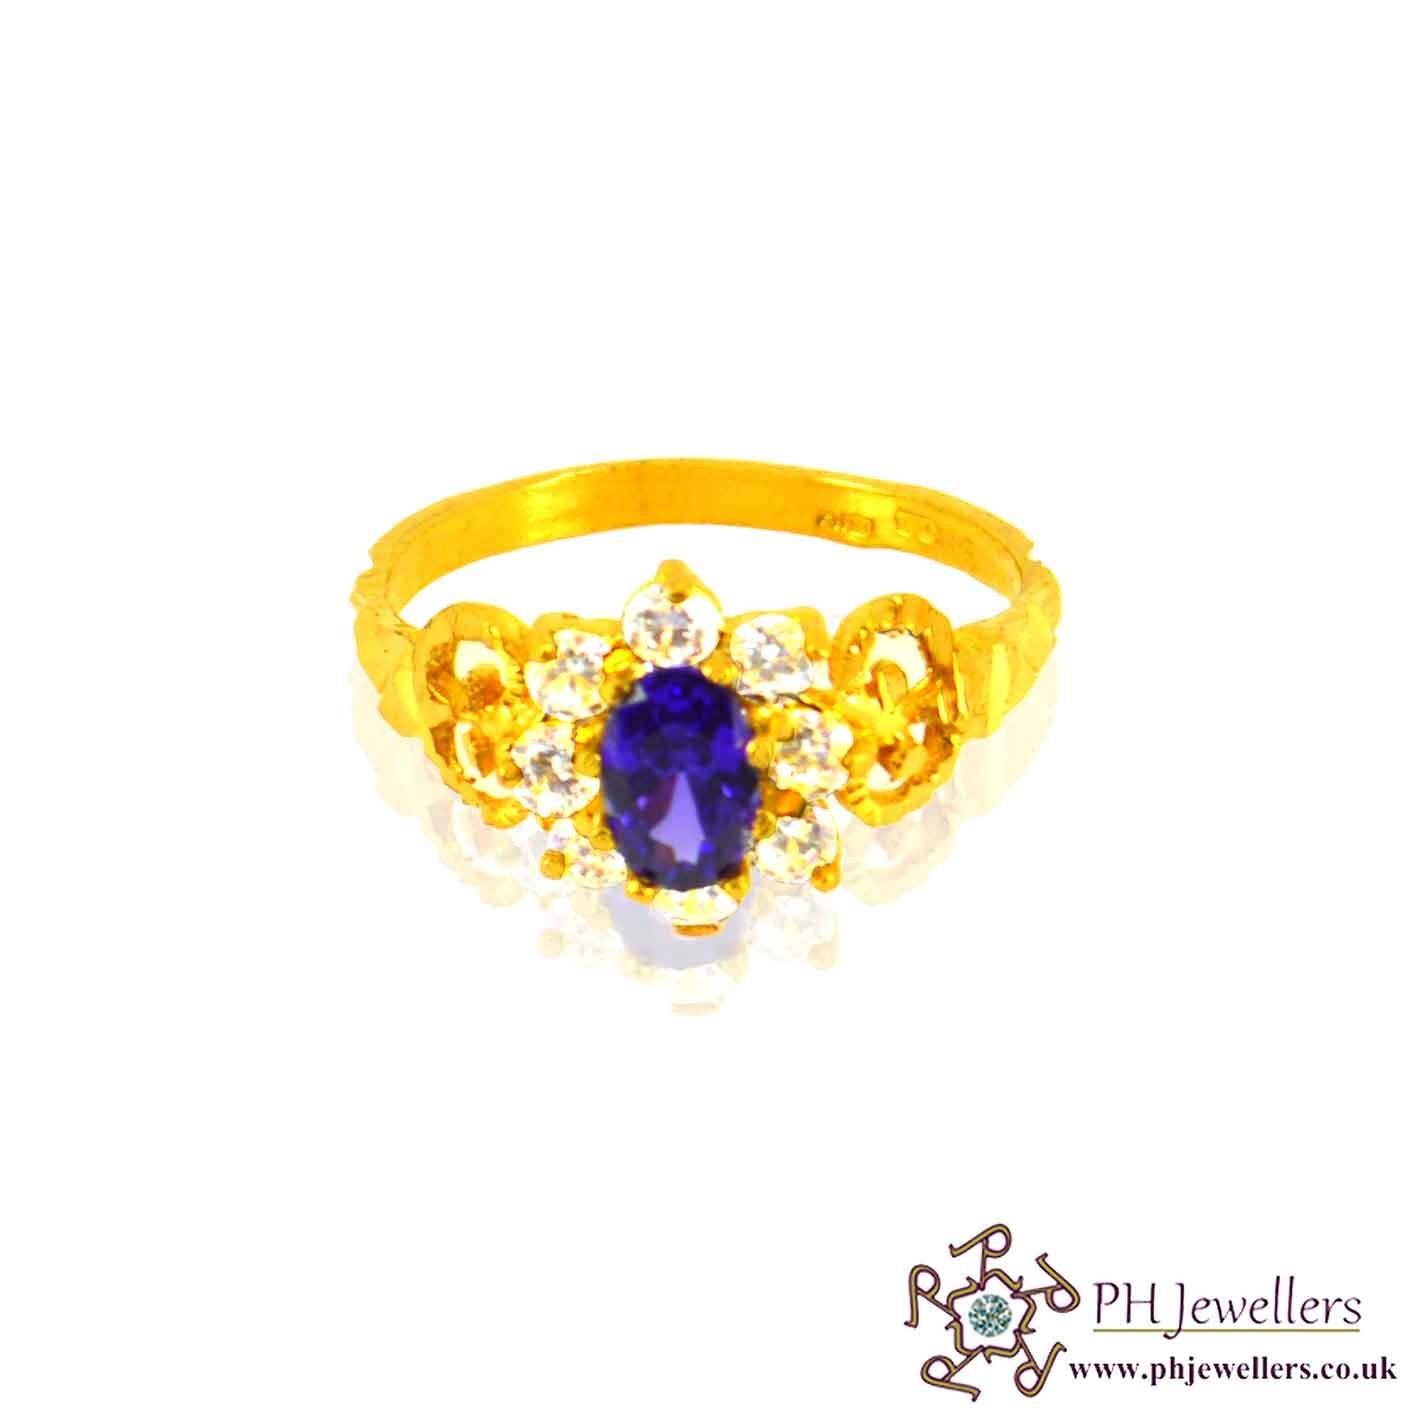 22ct 916 Hallmark Yellow Gold Round Amethist Size M,N,O Ring CZ SR15